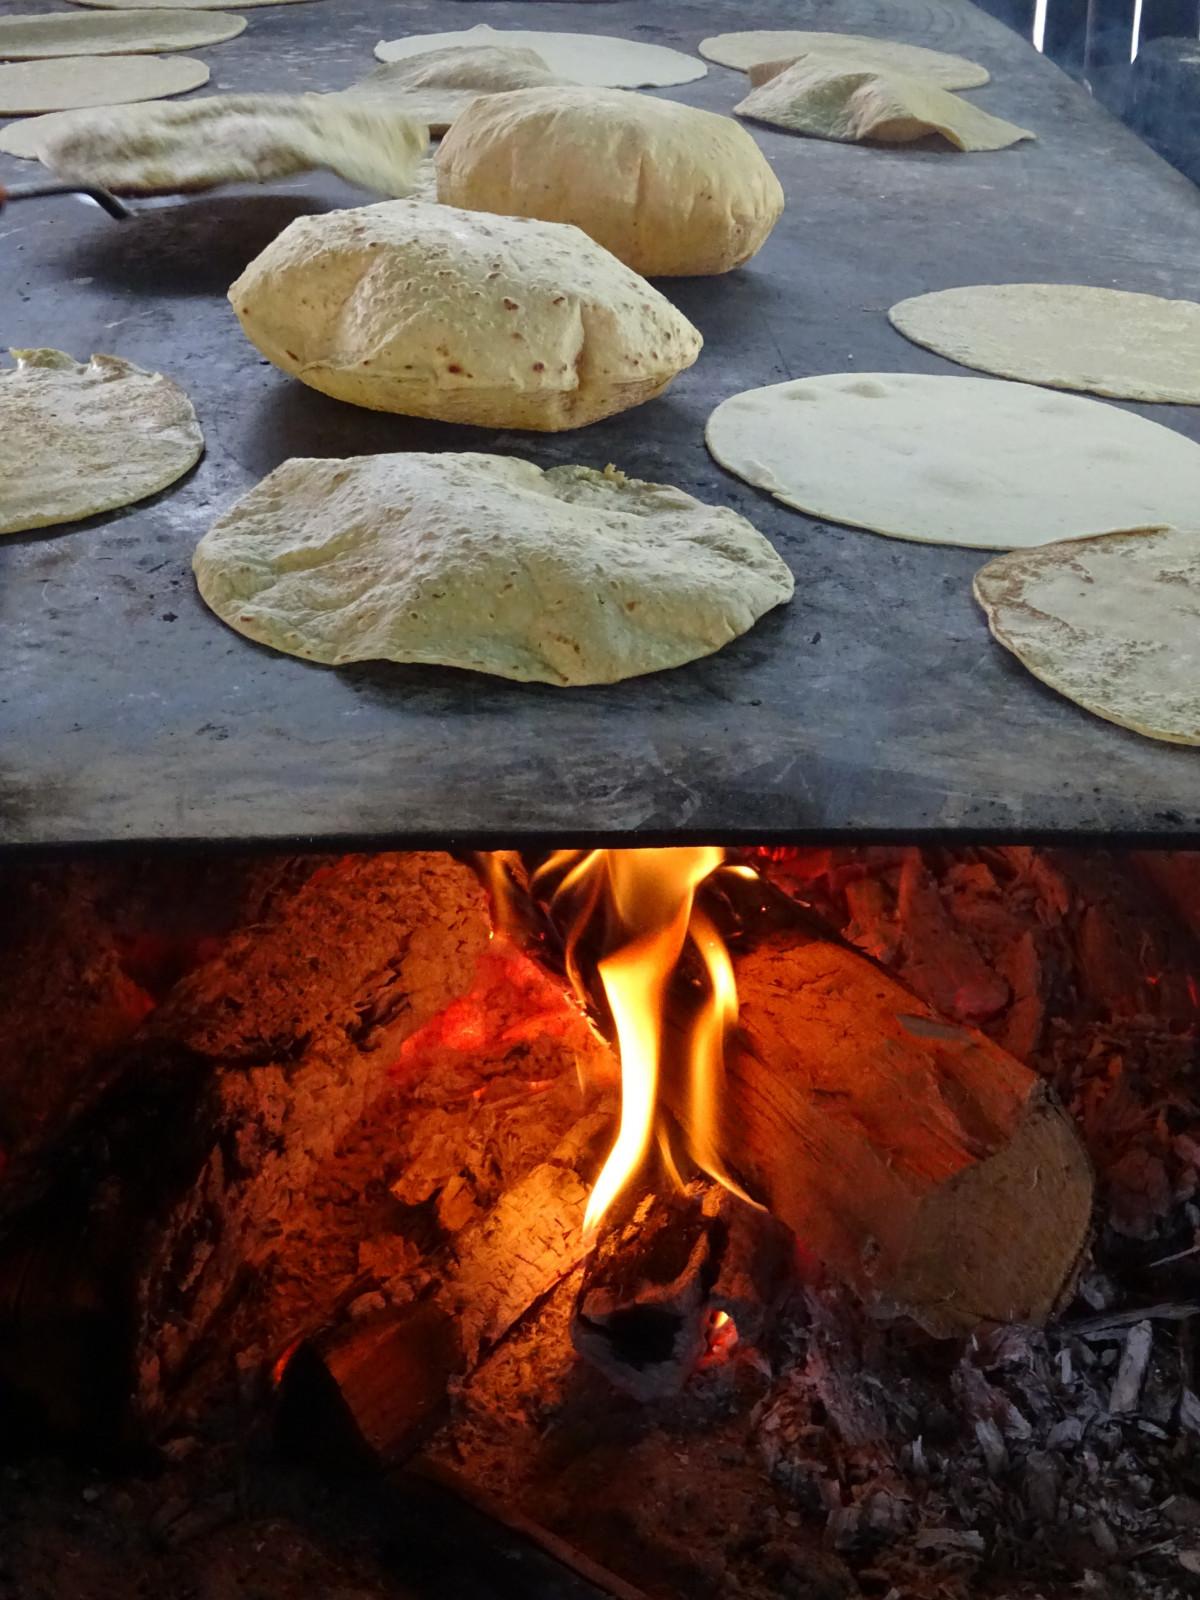 rock madera redondo comida maíz cocina fuego gastrónomo cocinar estufa geología nutrición Méjico tortilla Taco gastronomía tradicional inflar mexicano Lena típico Tortilla hecha a mano Comal